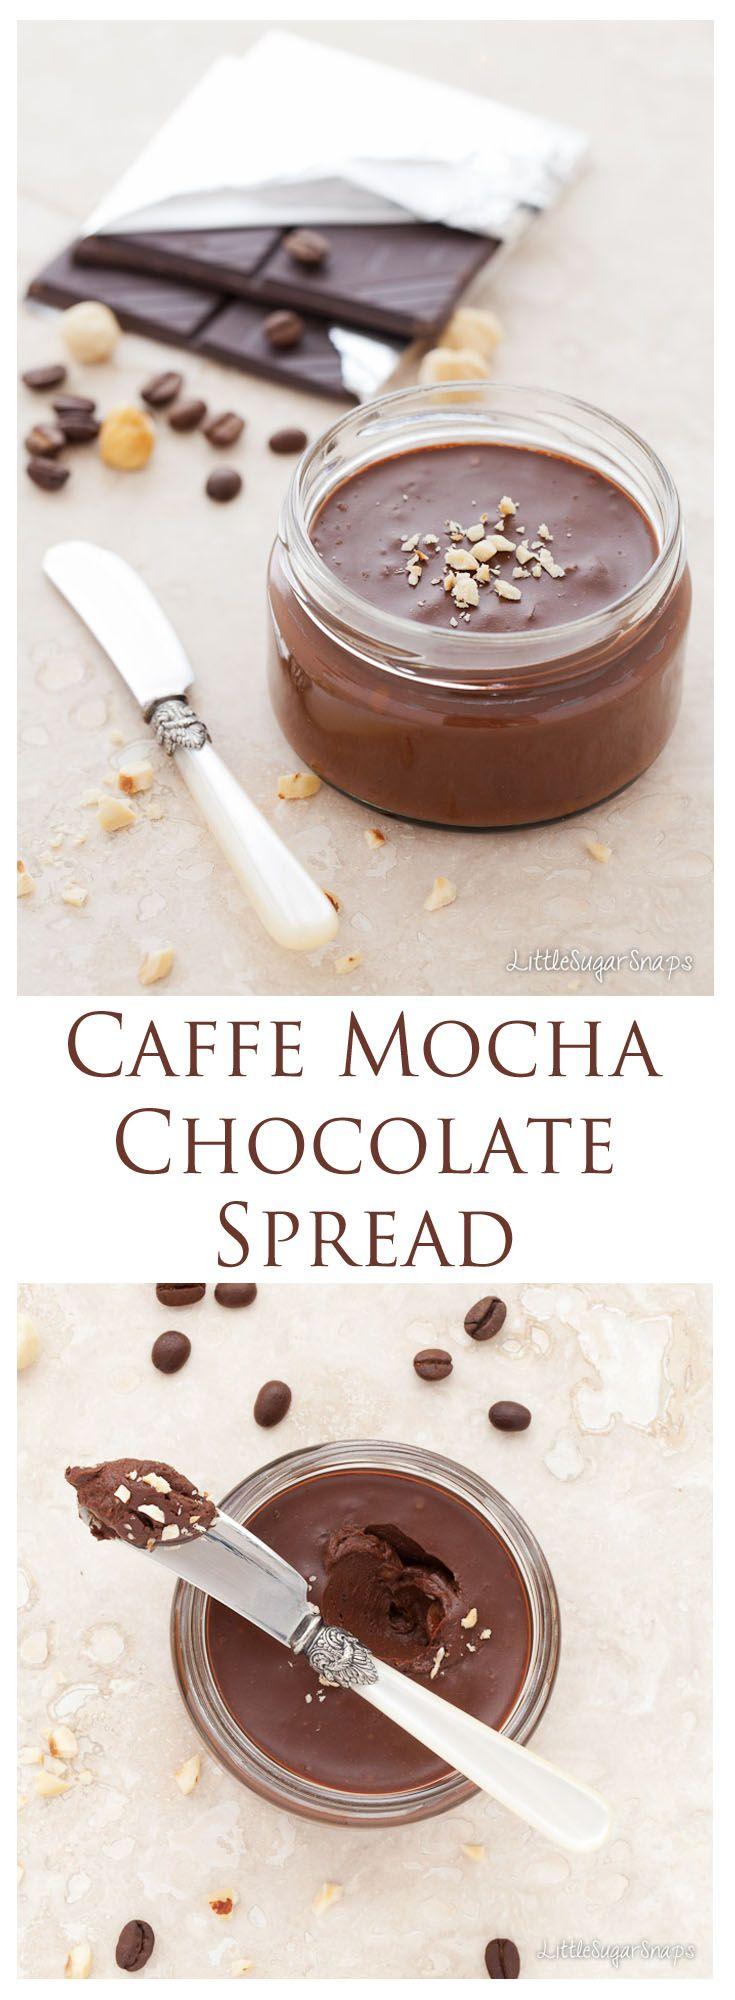 Caffe Mocha Chocolate Spread                                                                                                                                                                                 More